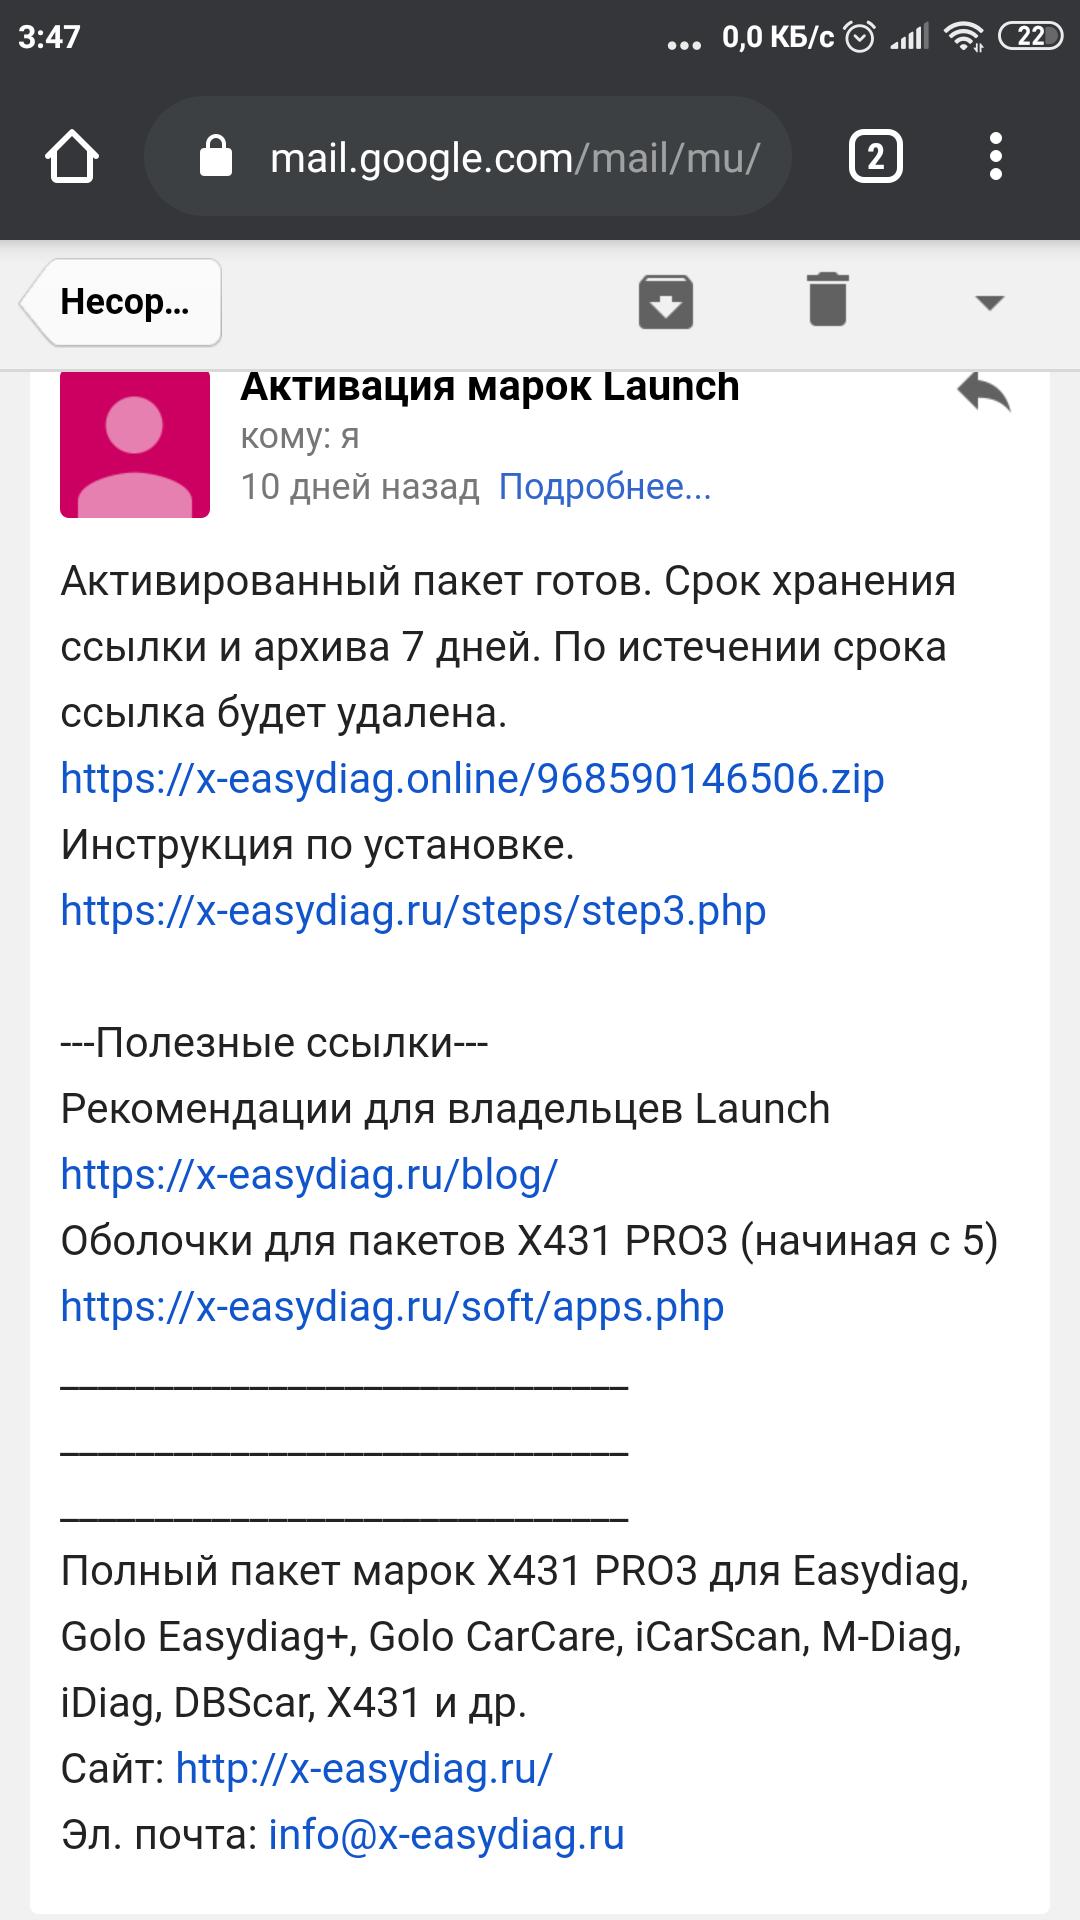 отзыв от Сергей из Москва о x-easydiag.ru